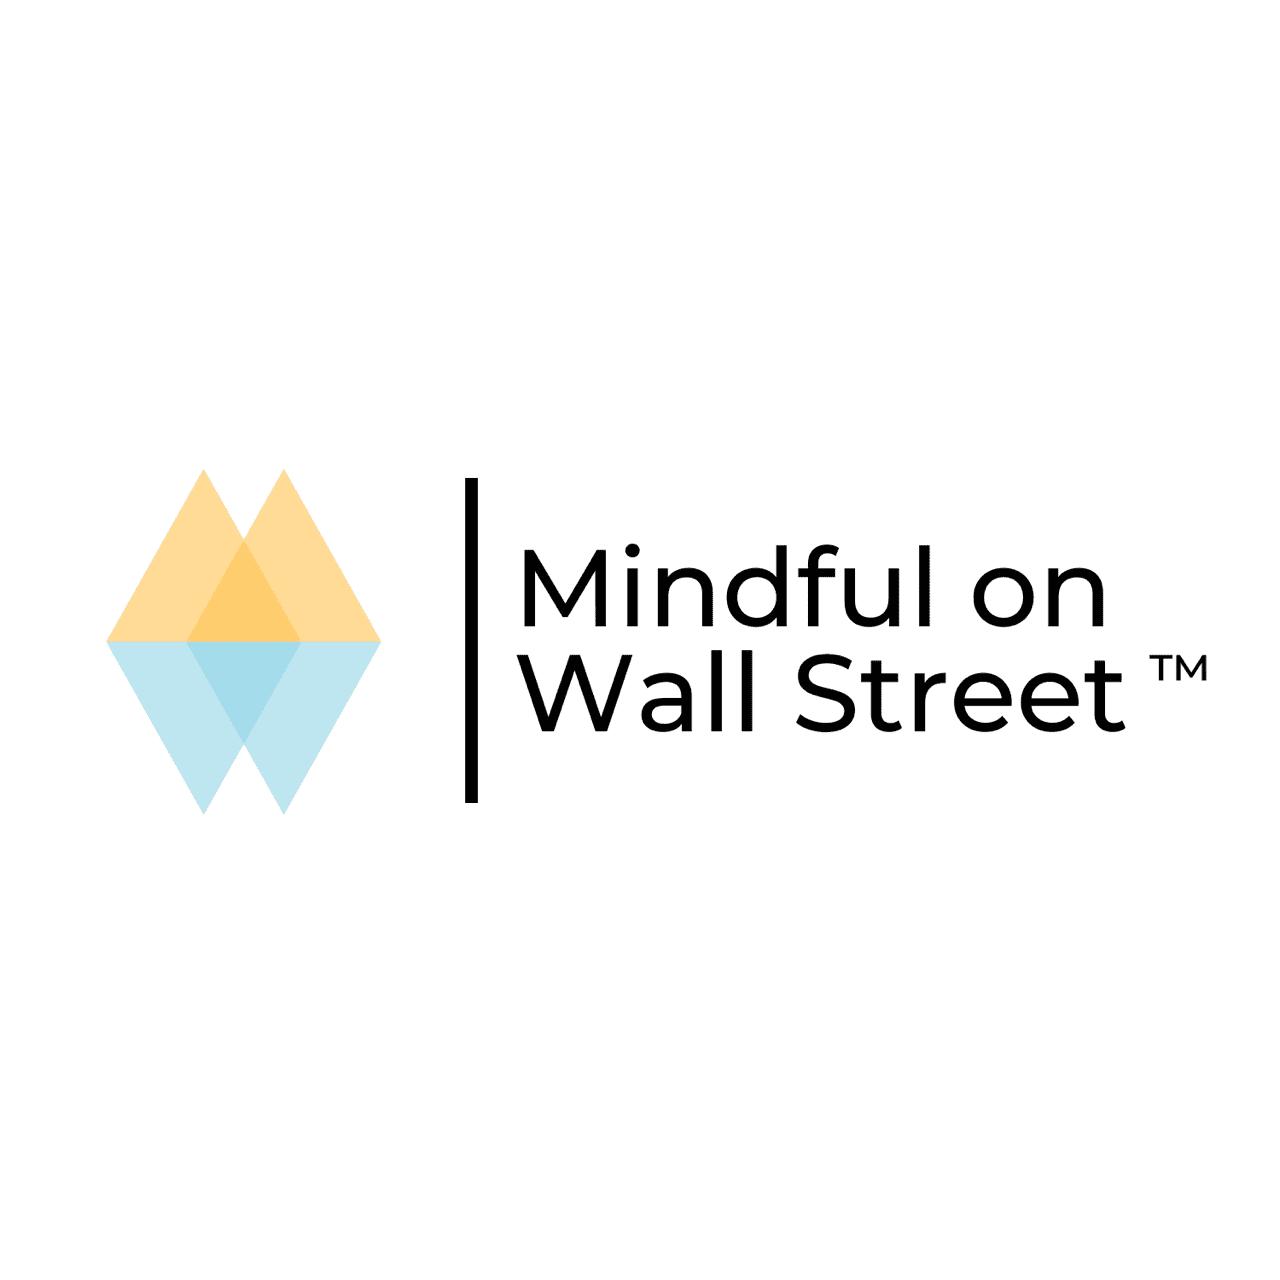 Mindful on Wall Street logo